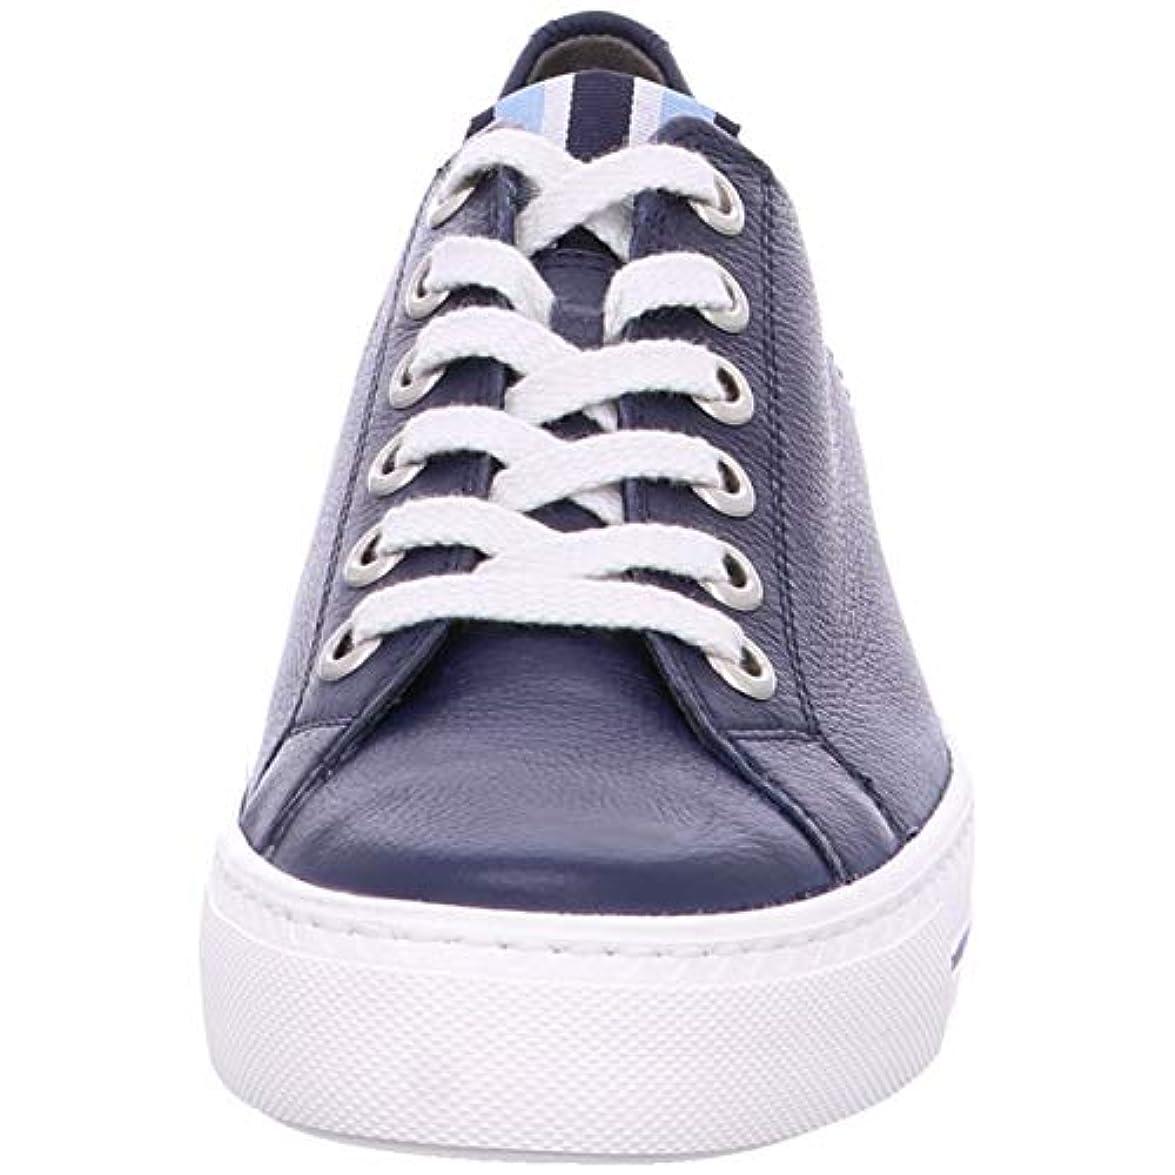 Shoe Paul Green - Trainer 4779